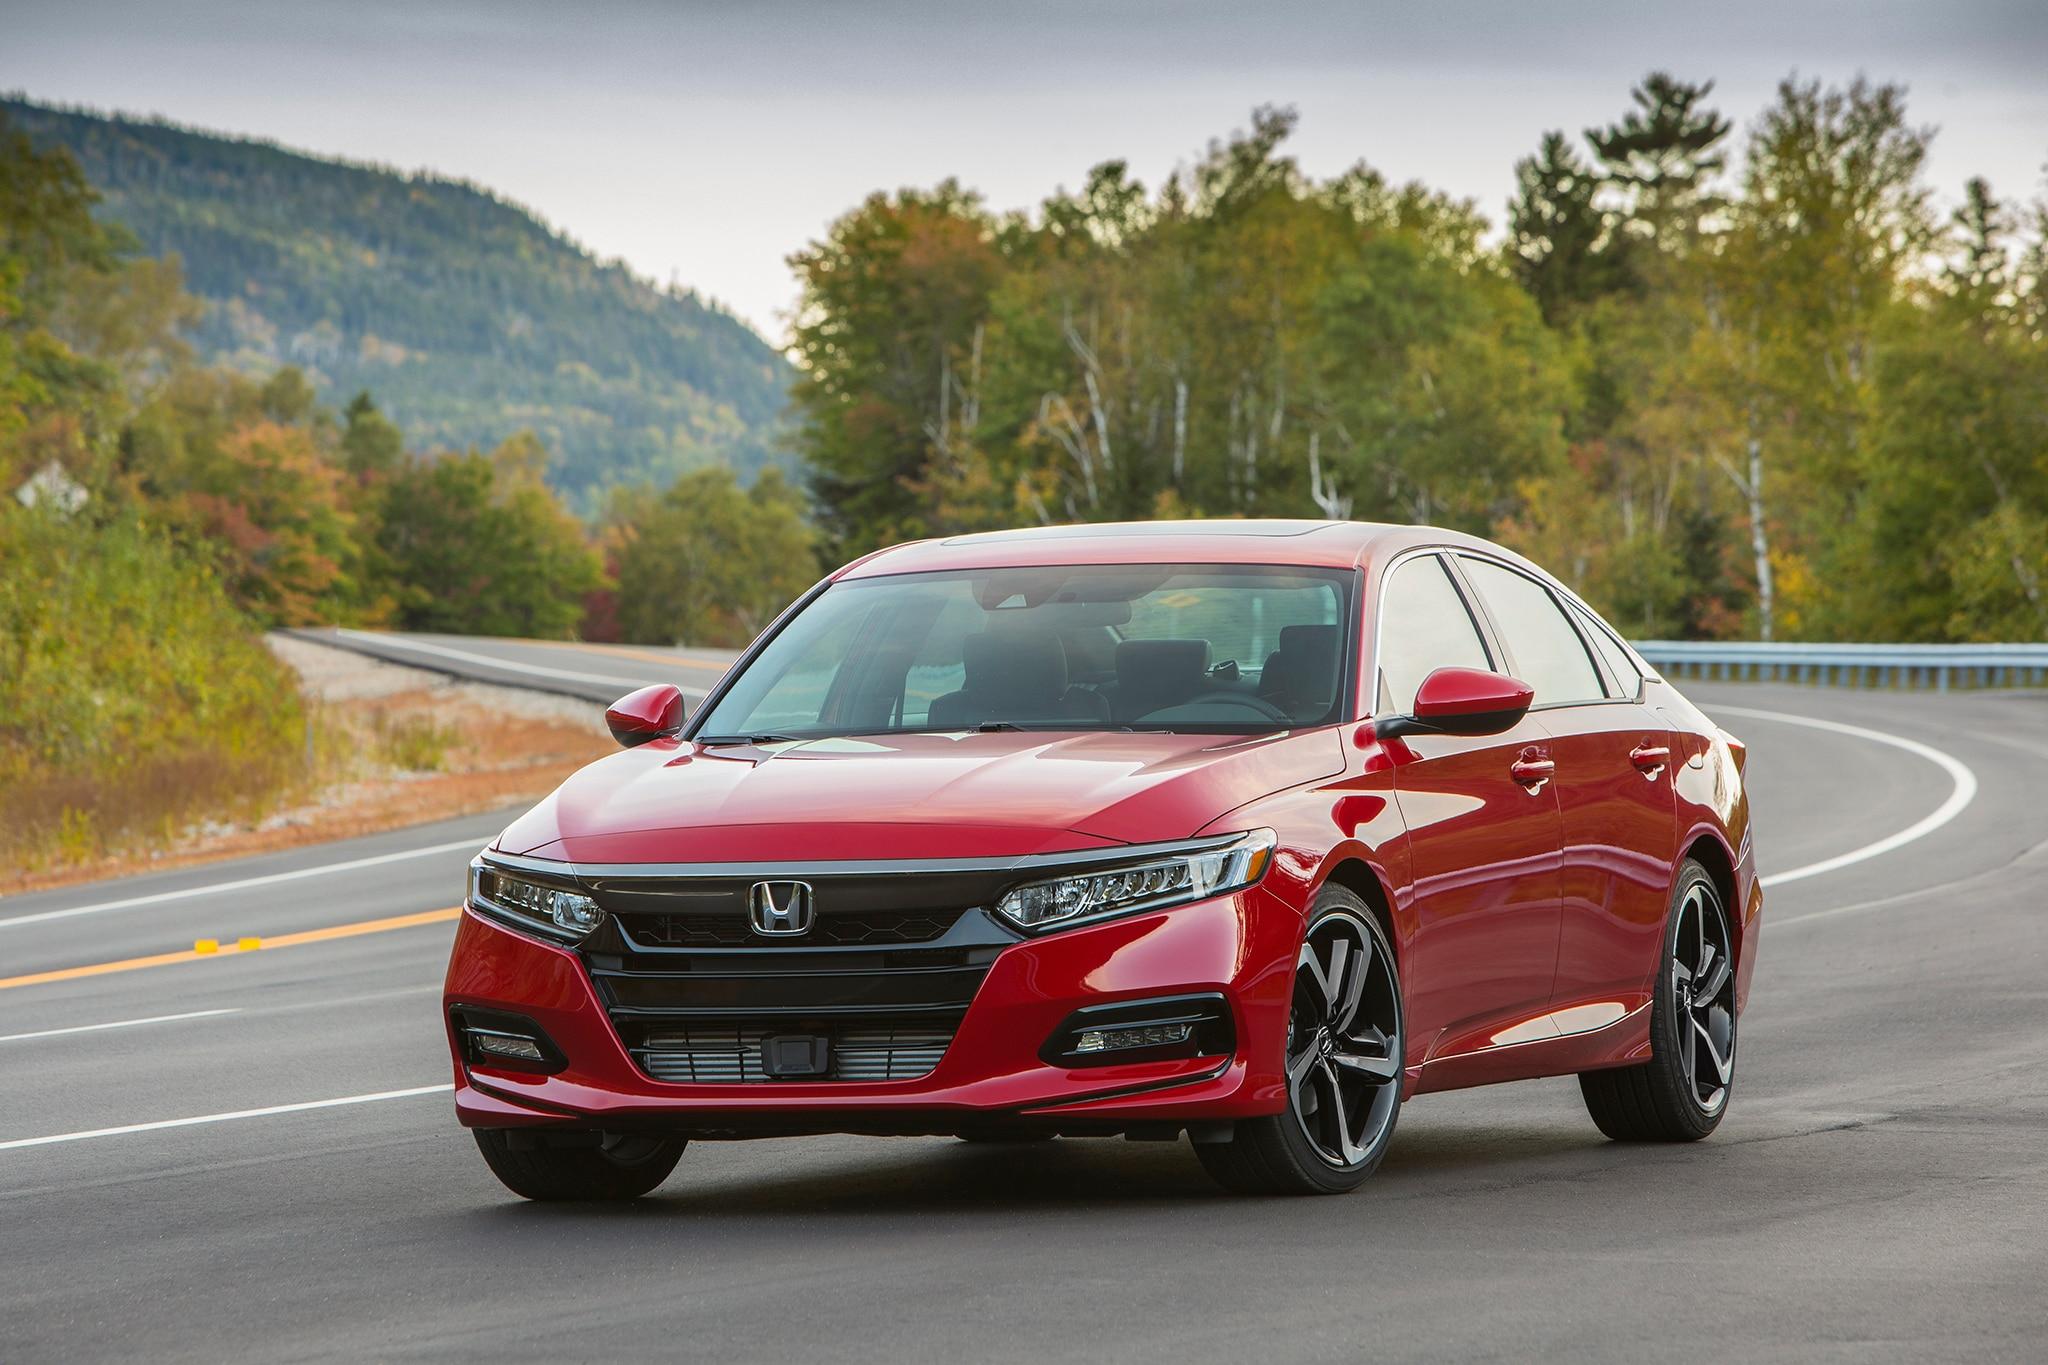 First Drive: 2018 Honda Accord | Automobile Magazine